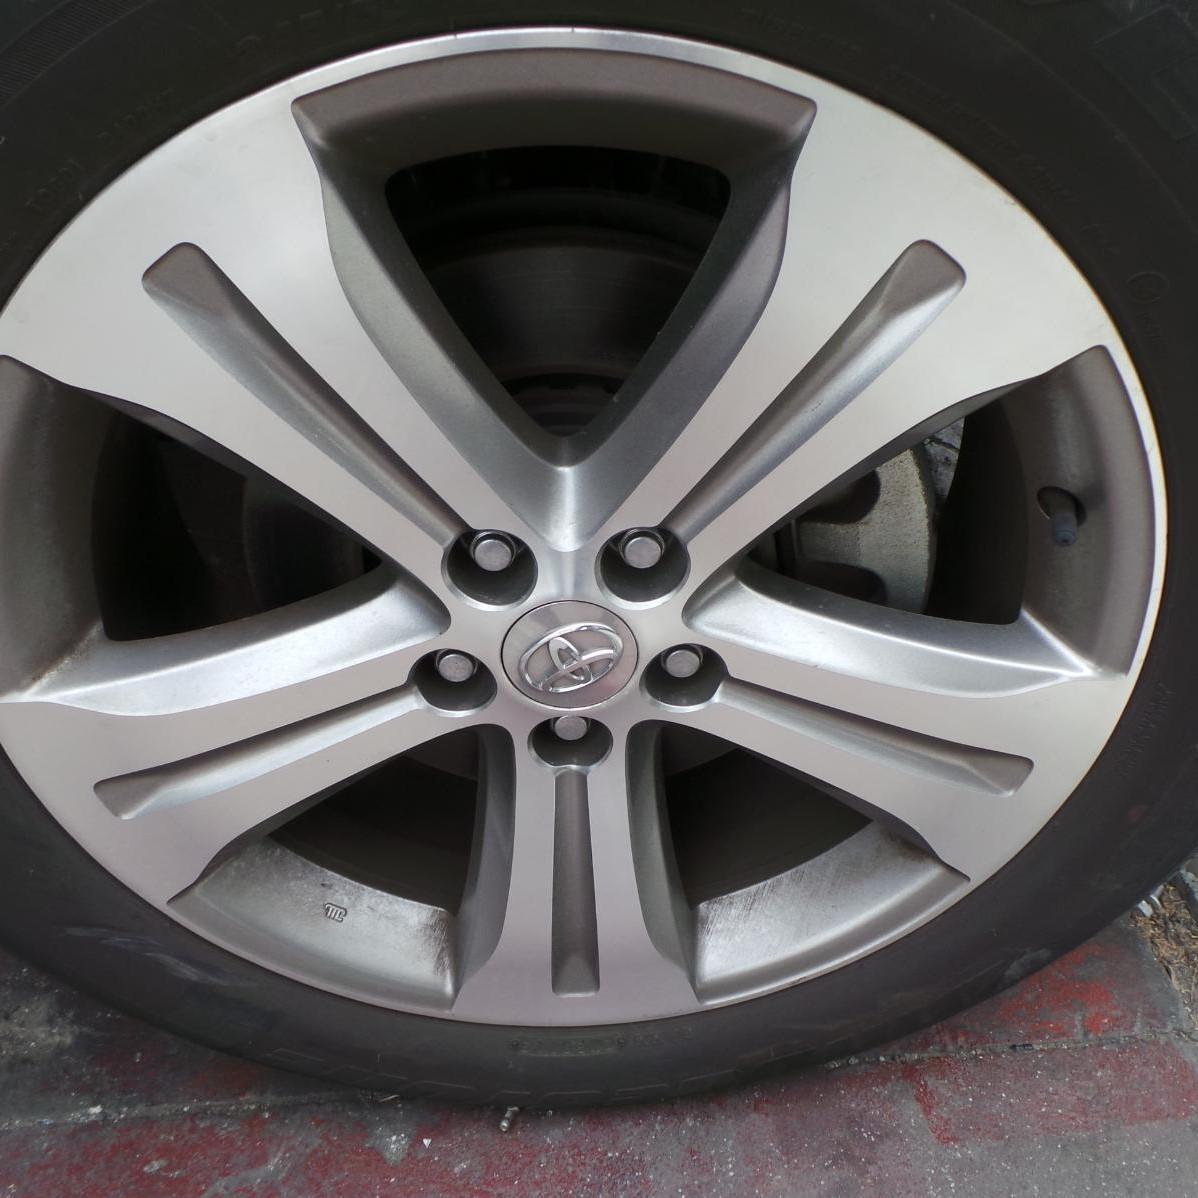 TOYOTA KLUGER, Wheel Mag, FACTORY, 19X7.5IN, 5 SPOKE, GSU40-GSU45, 08/07-02/14